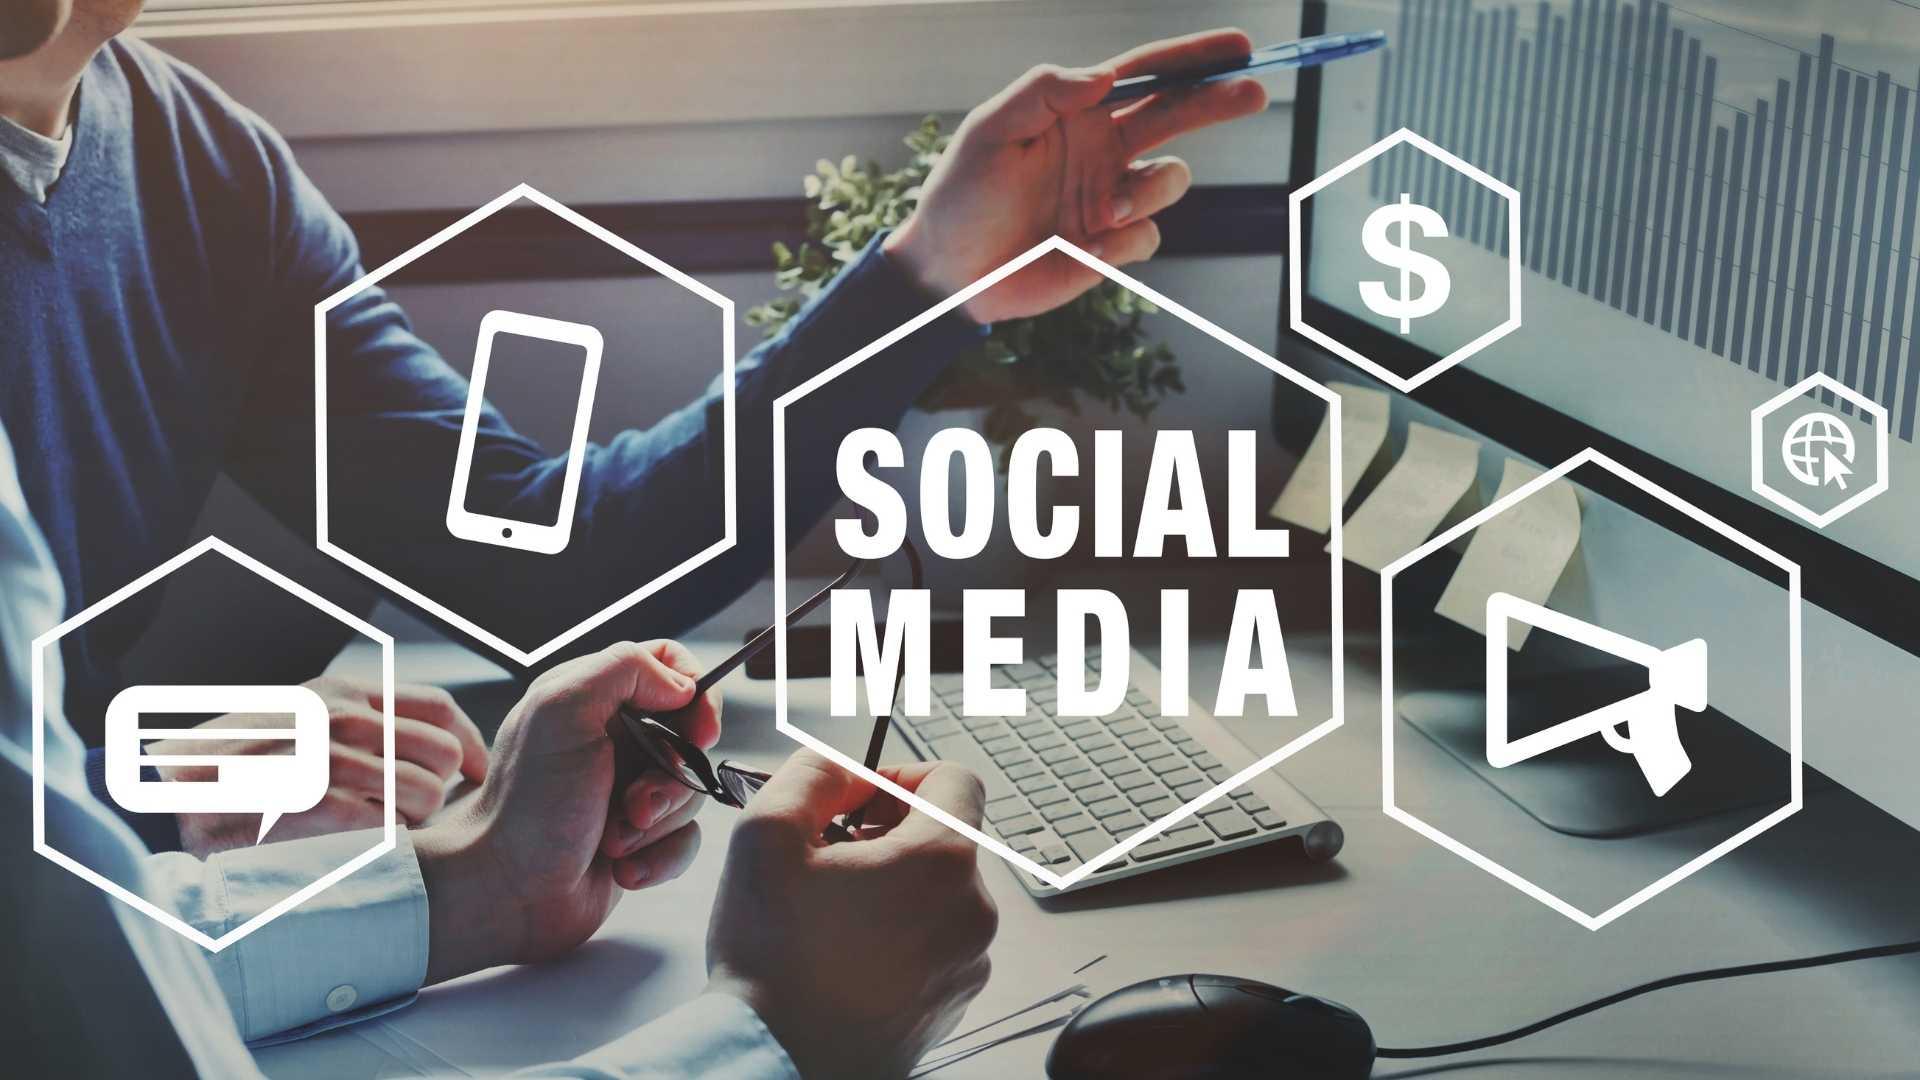 Social Media for Real Estate Agency Marketing